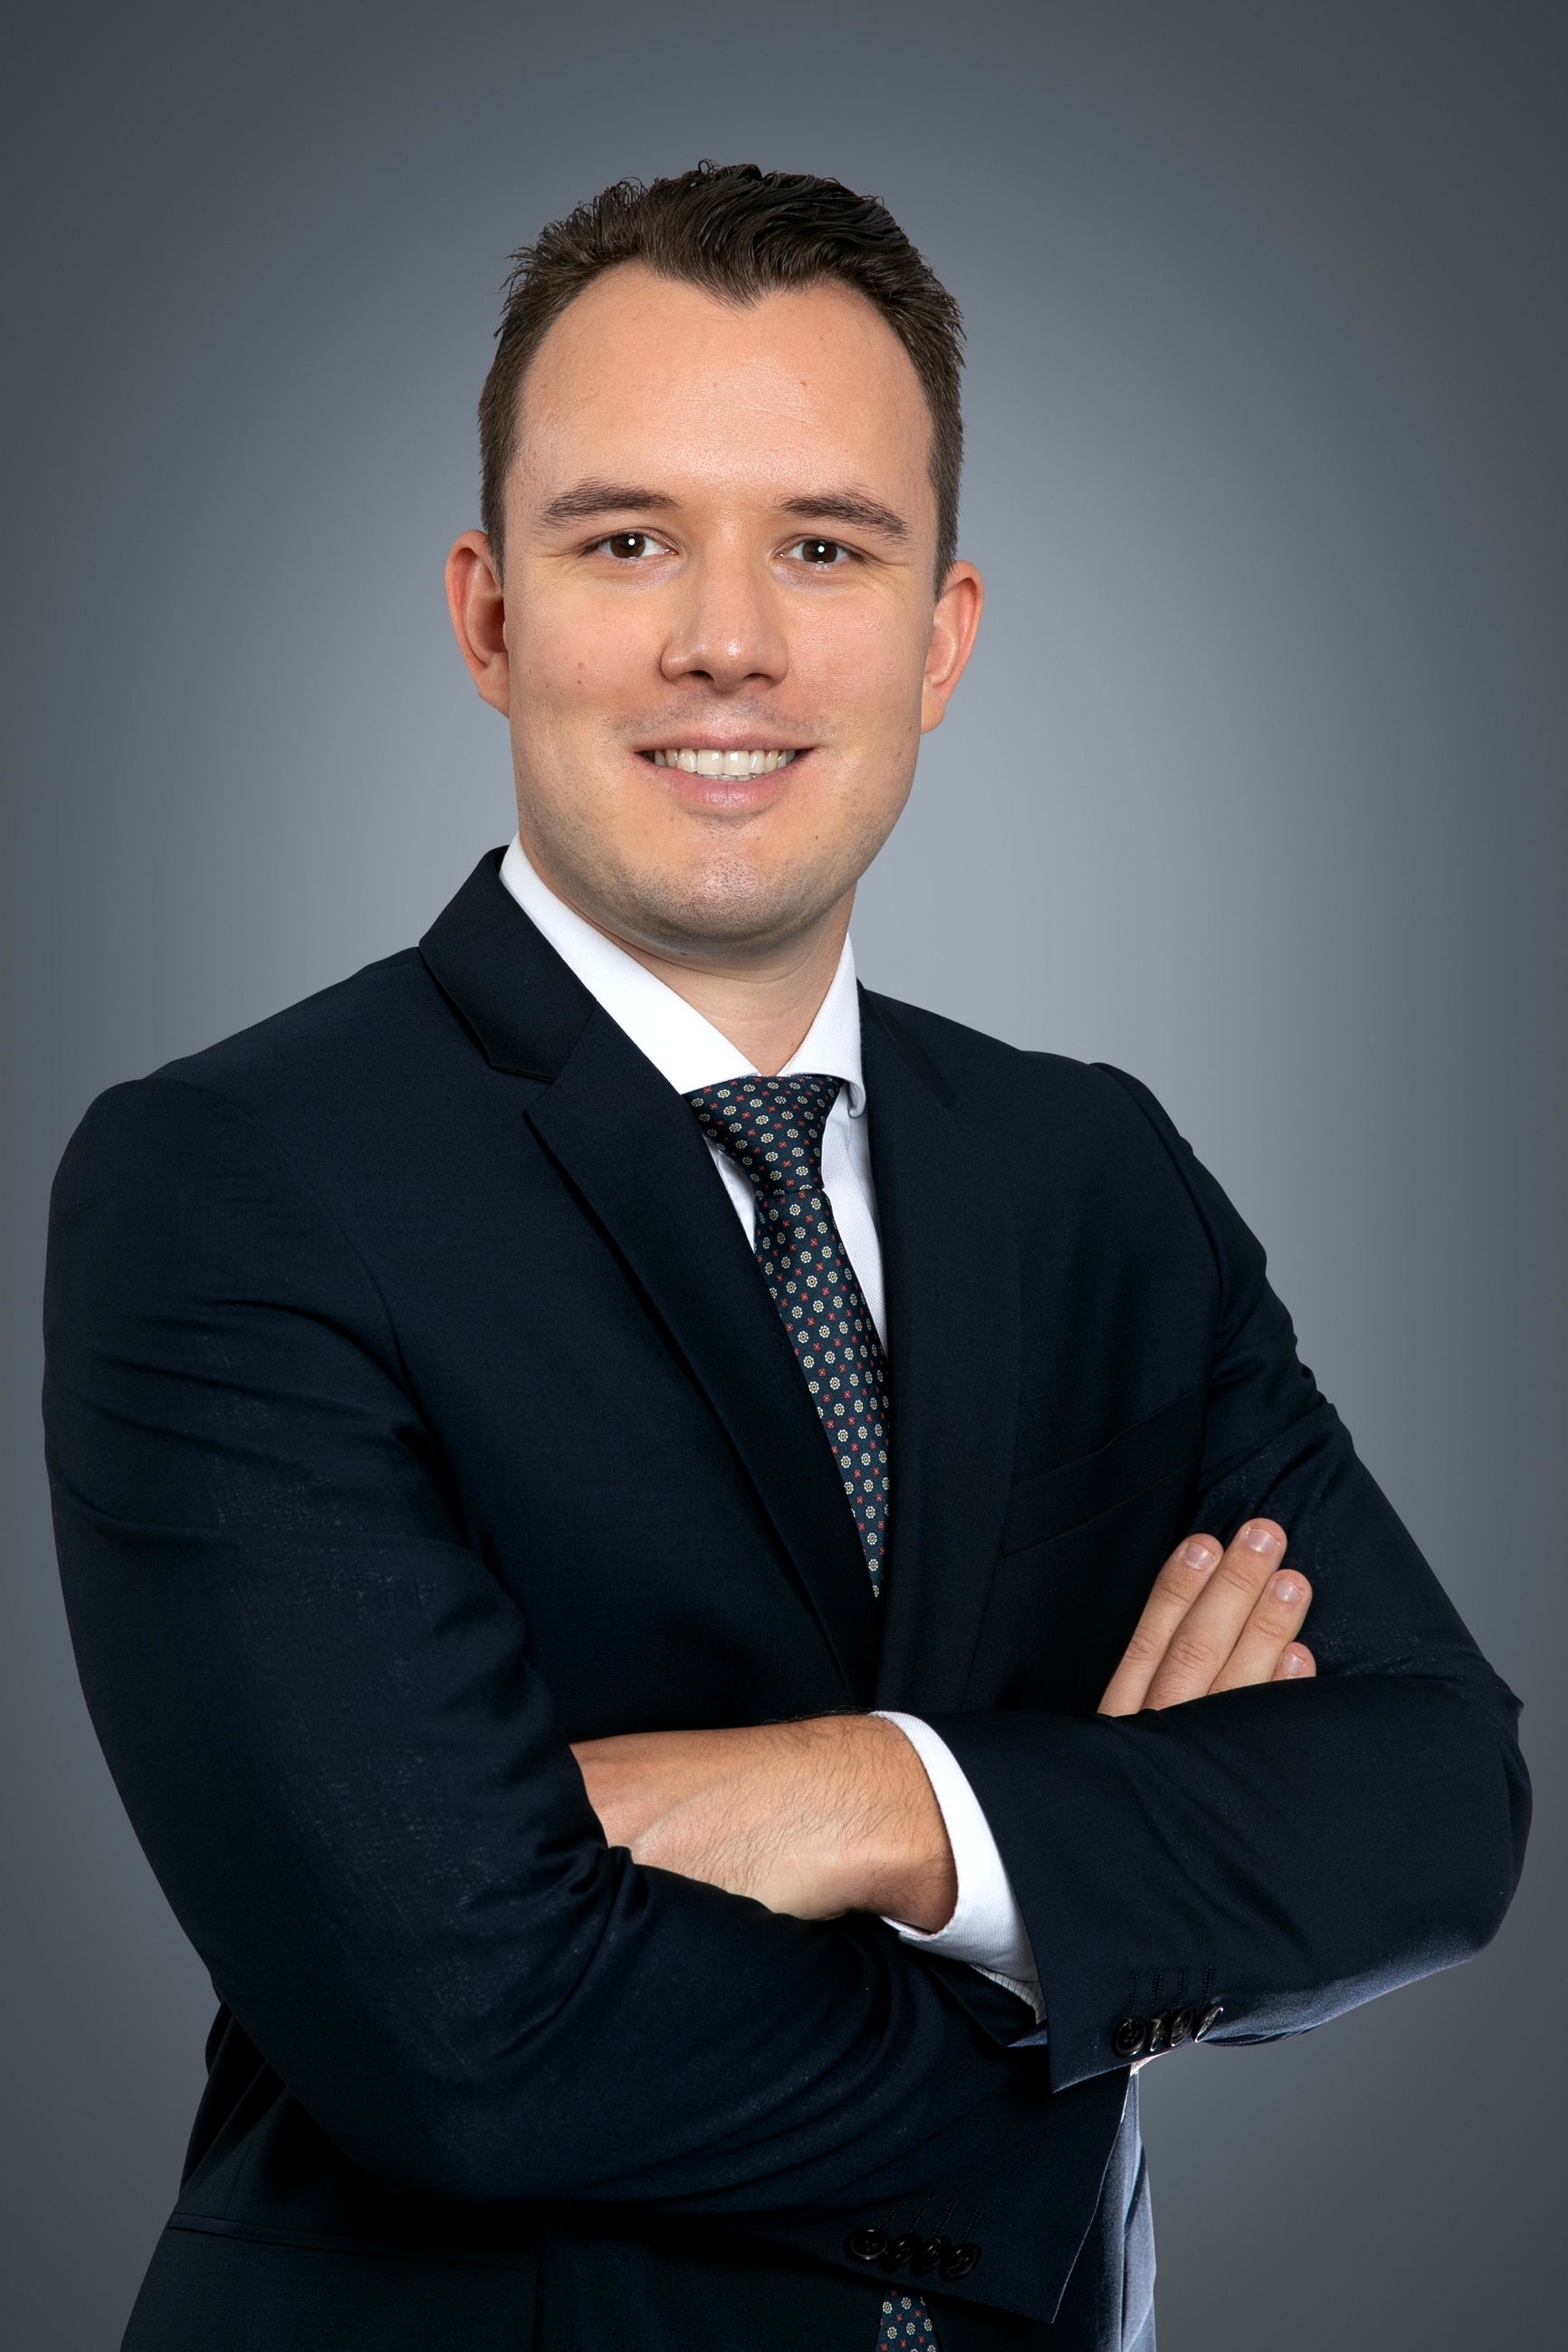 Florian Zingraff